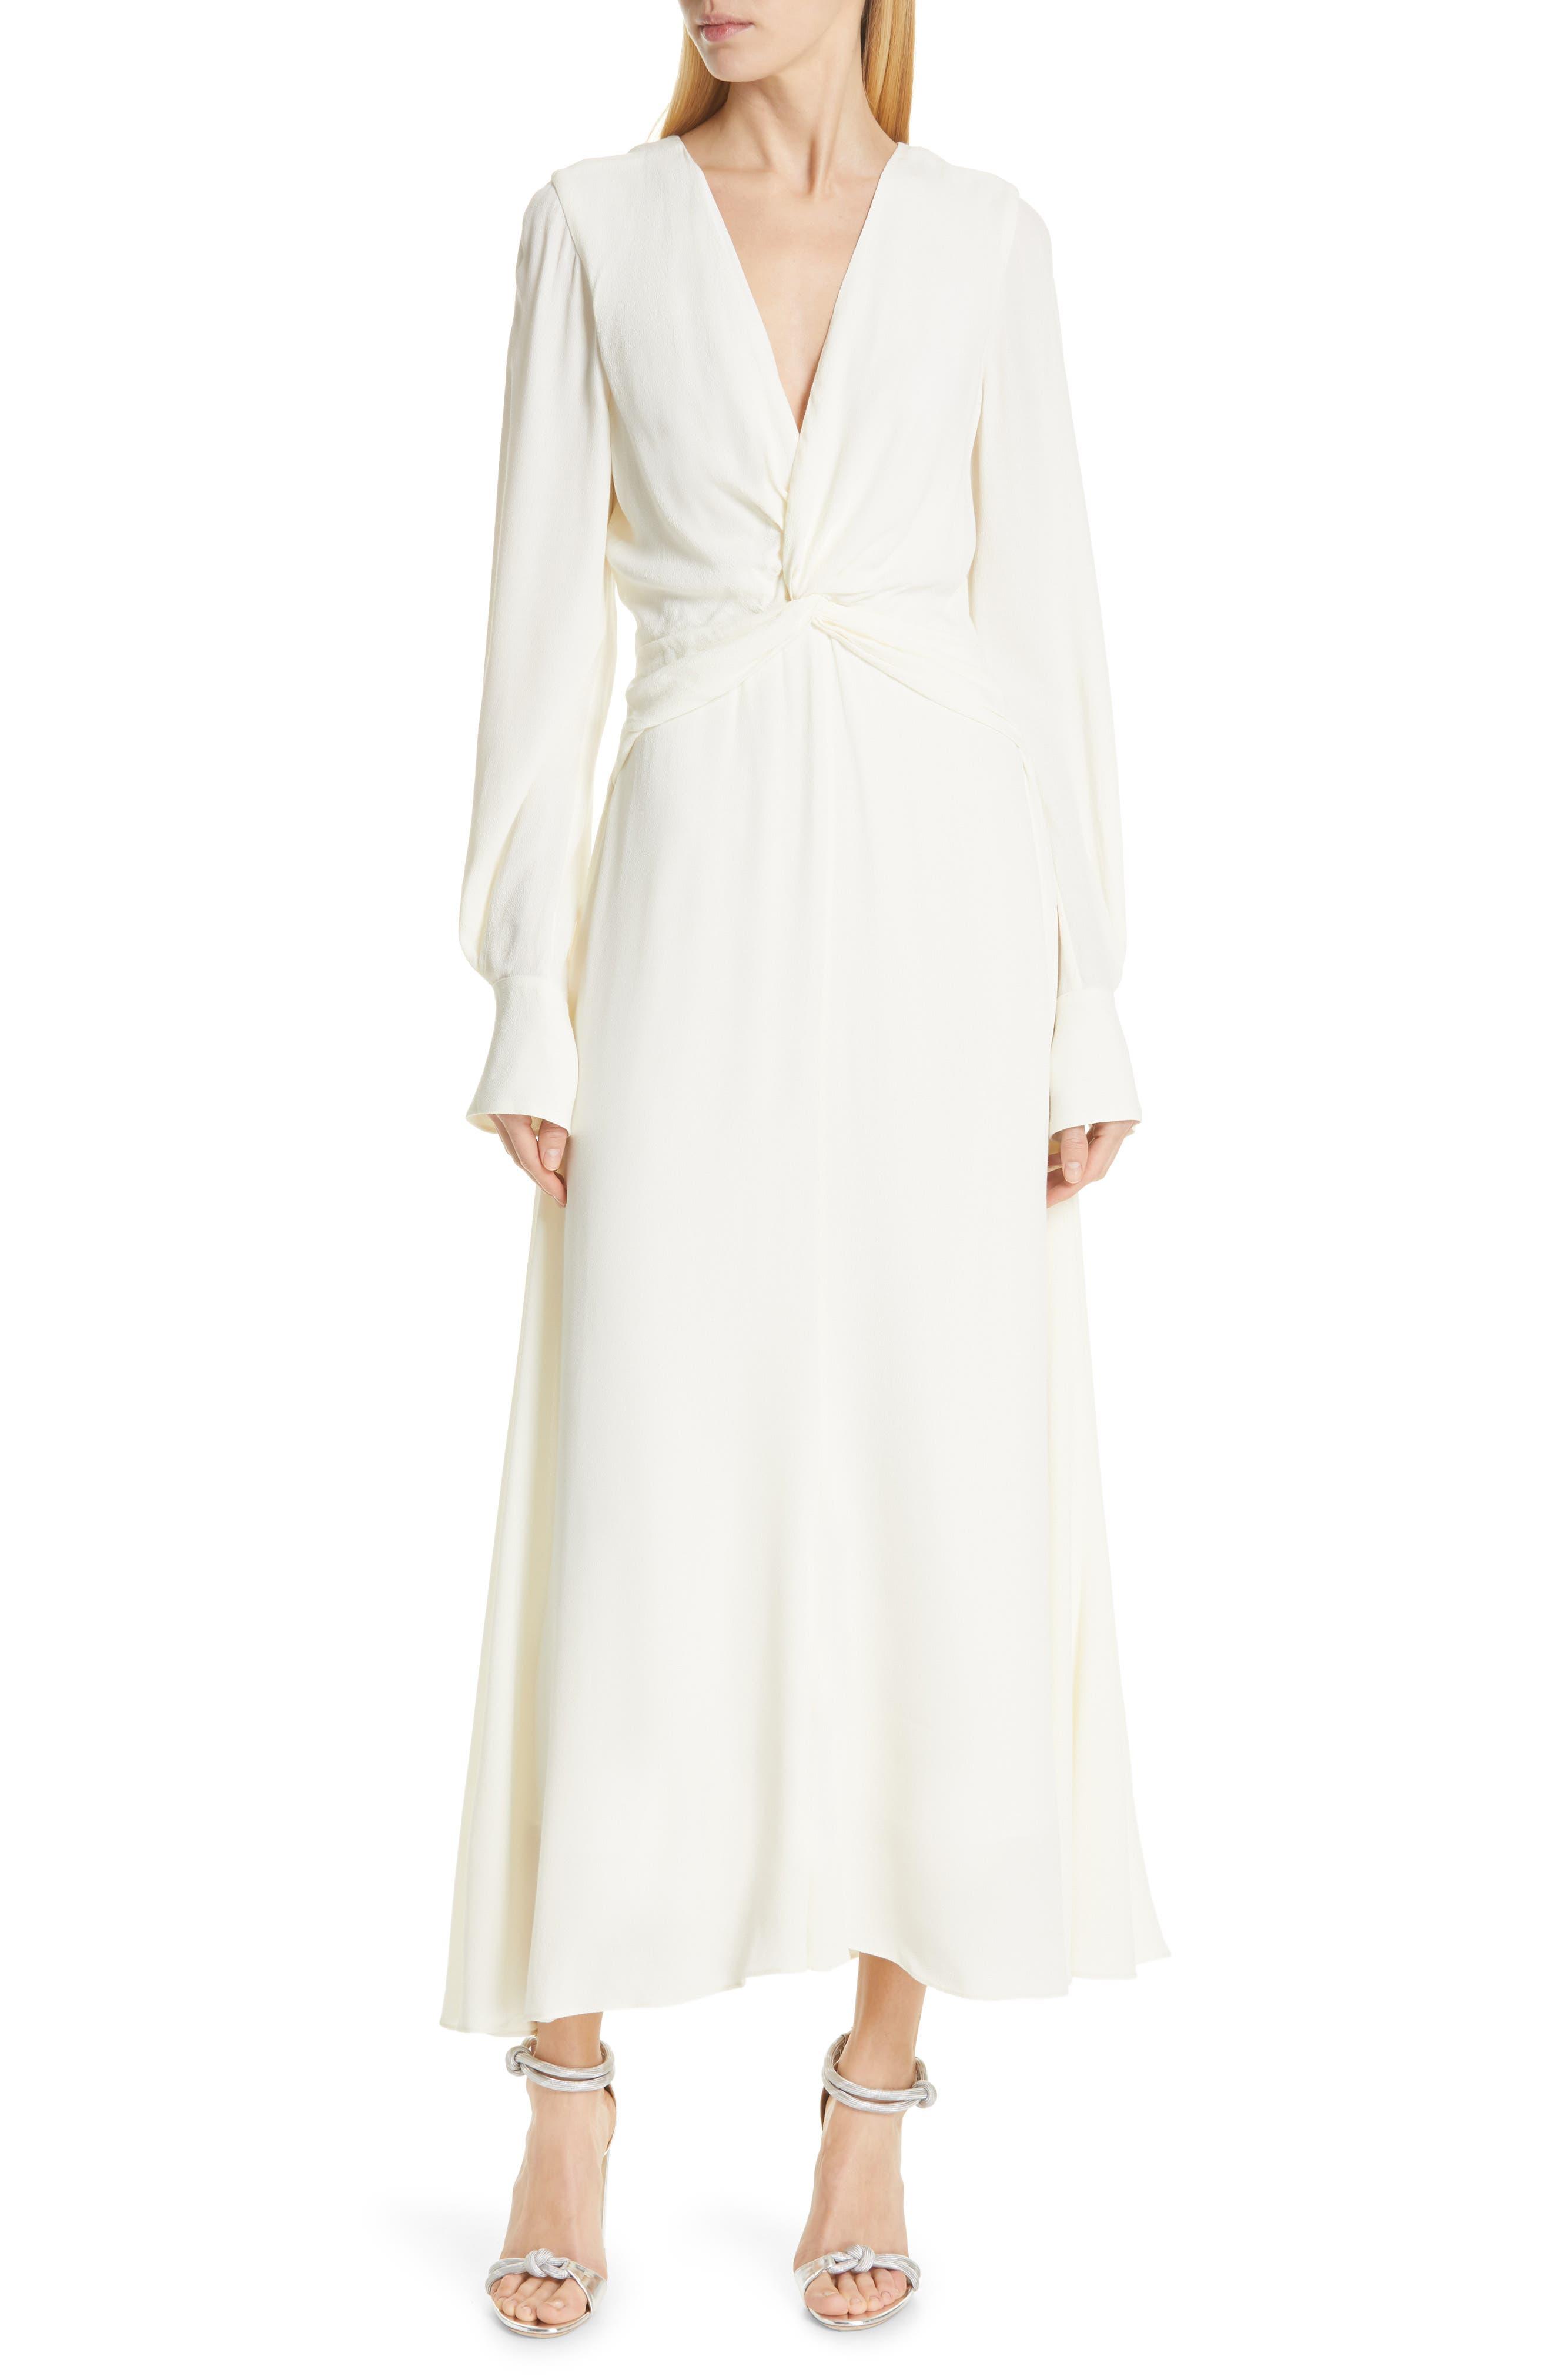 EQUIPMENT, Faun Twist Front Dress, Main thumbnail 1, color, NATURE WHITE